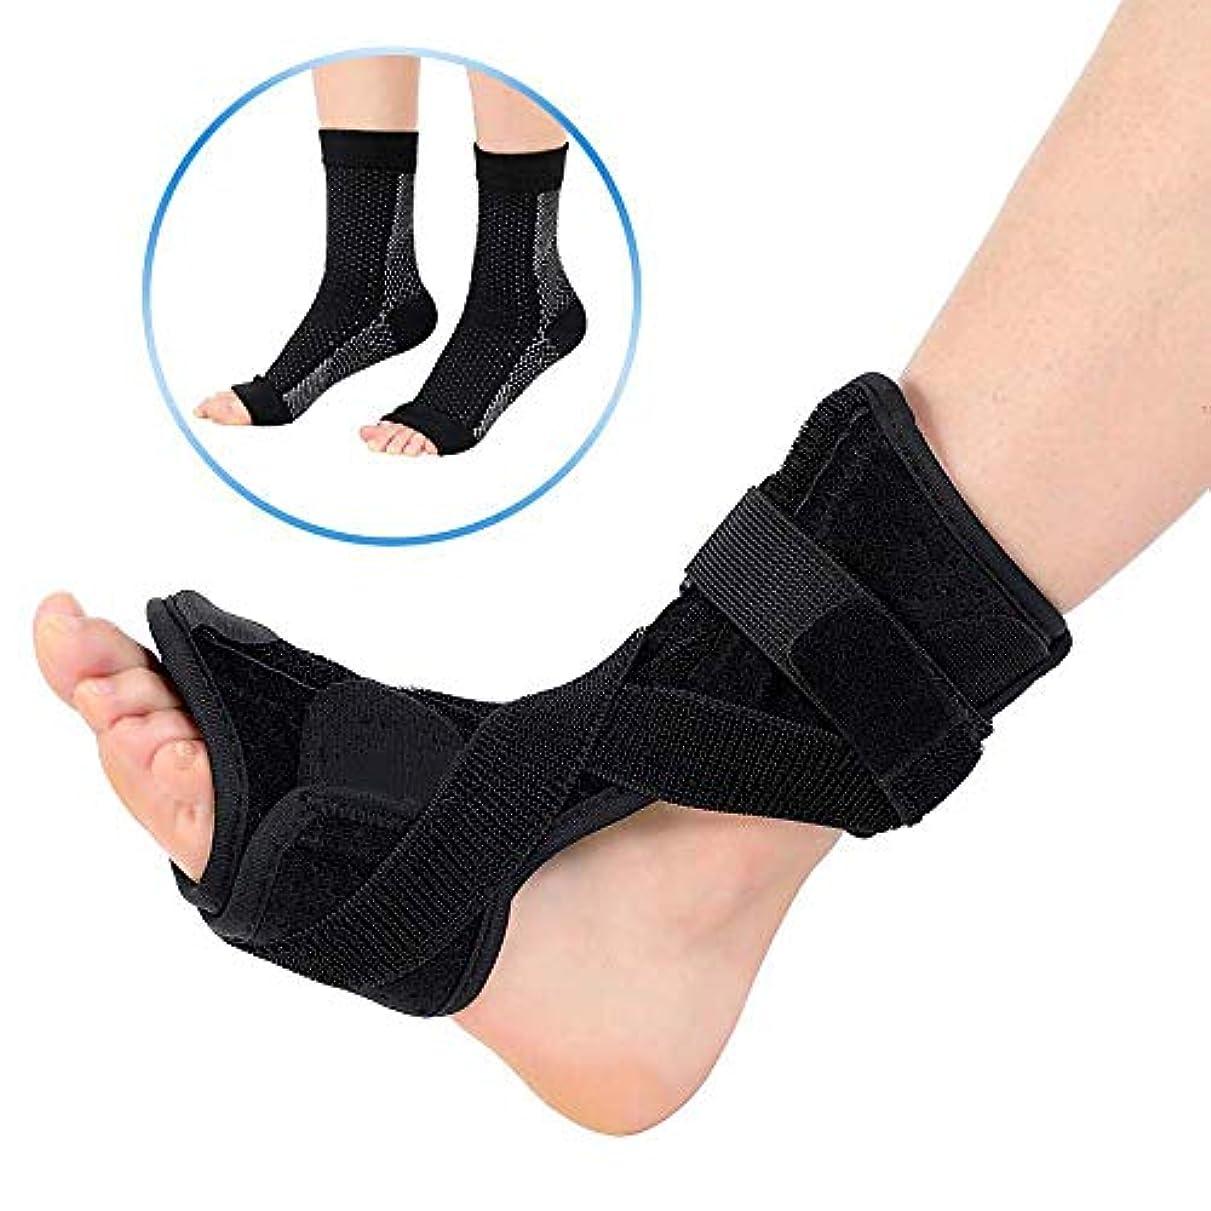 gundoop 足首サポーター 固定 捻挫対策 垂れ足矯正 捻挫?怪我防止 足底筋膜炎 痛み軽減 助用靴下付き 調節可能 屈曲可能なアルミボード入り 関節 靭帯 保護 通気性抜群 男女兼用